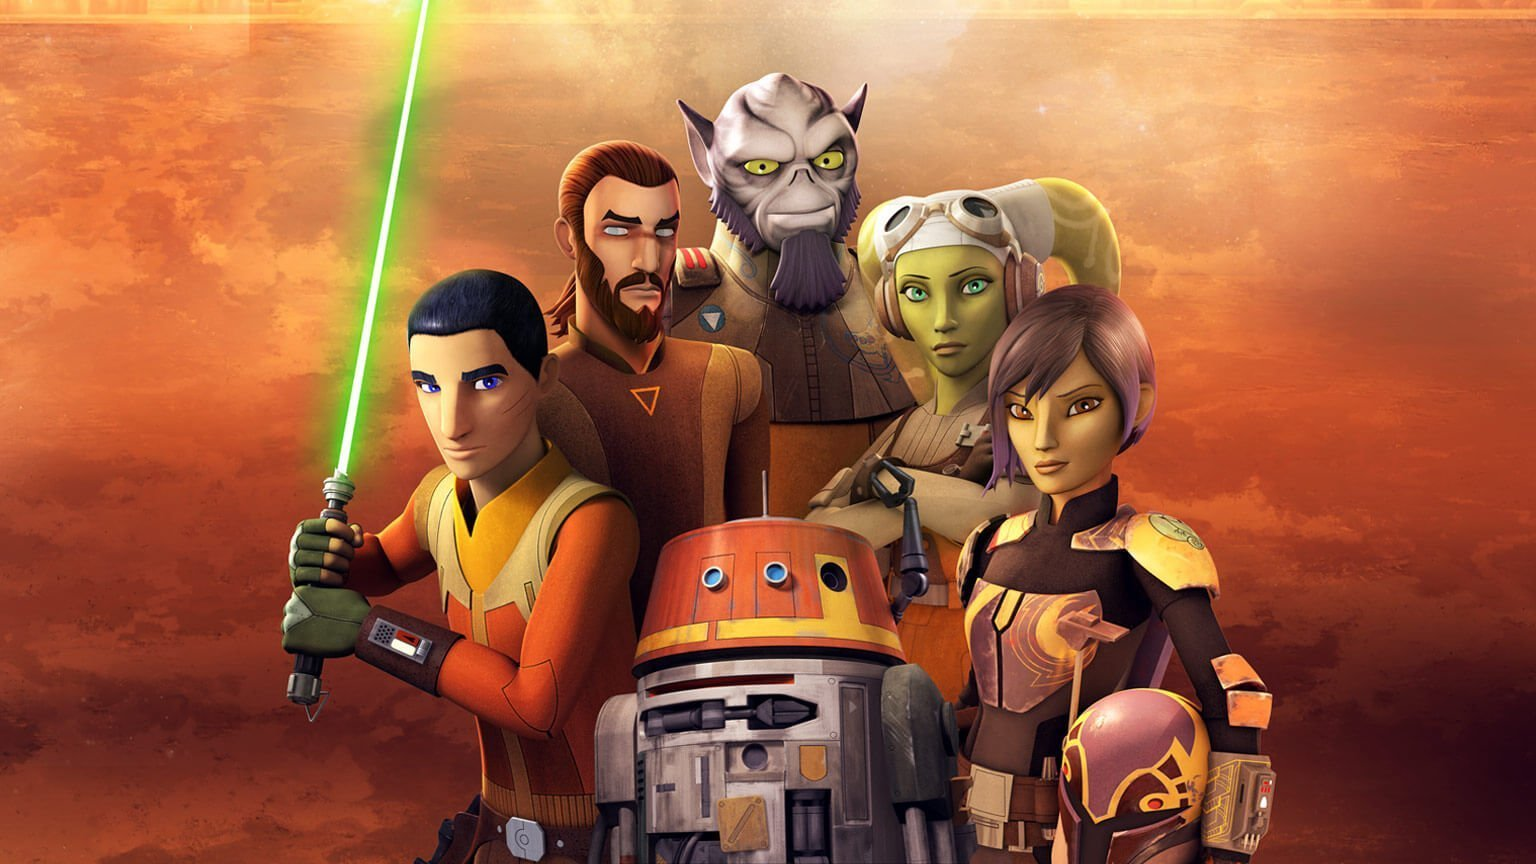 Karabast Star Wars! It's Over!